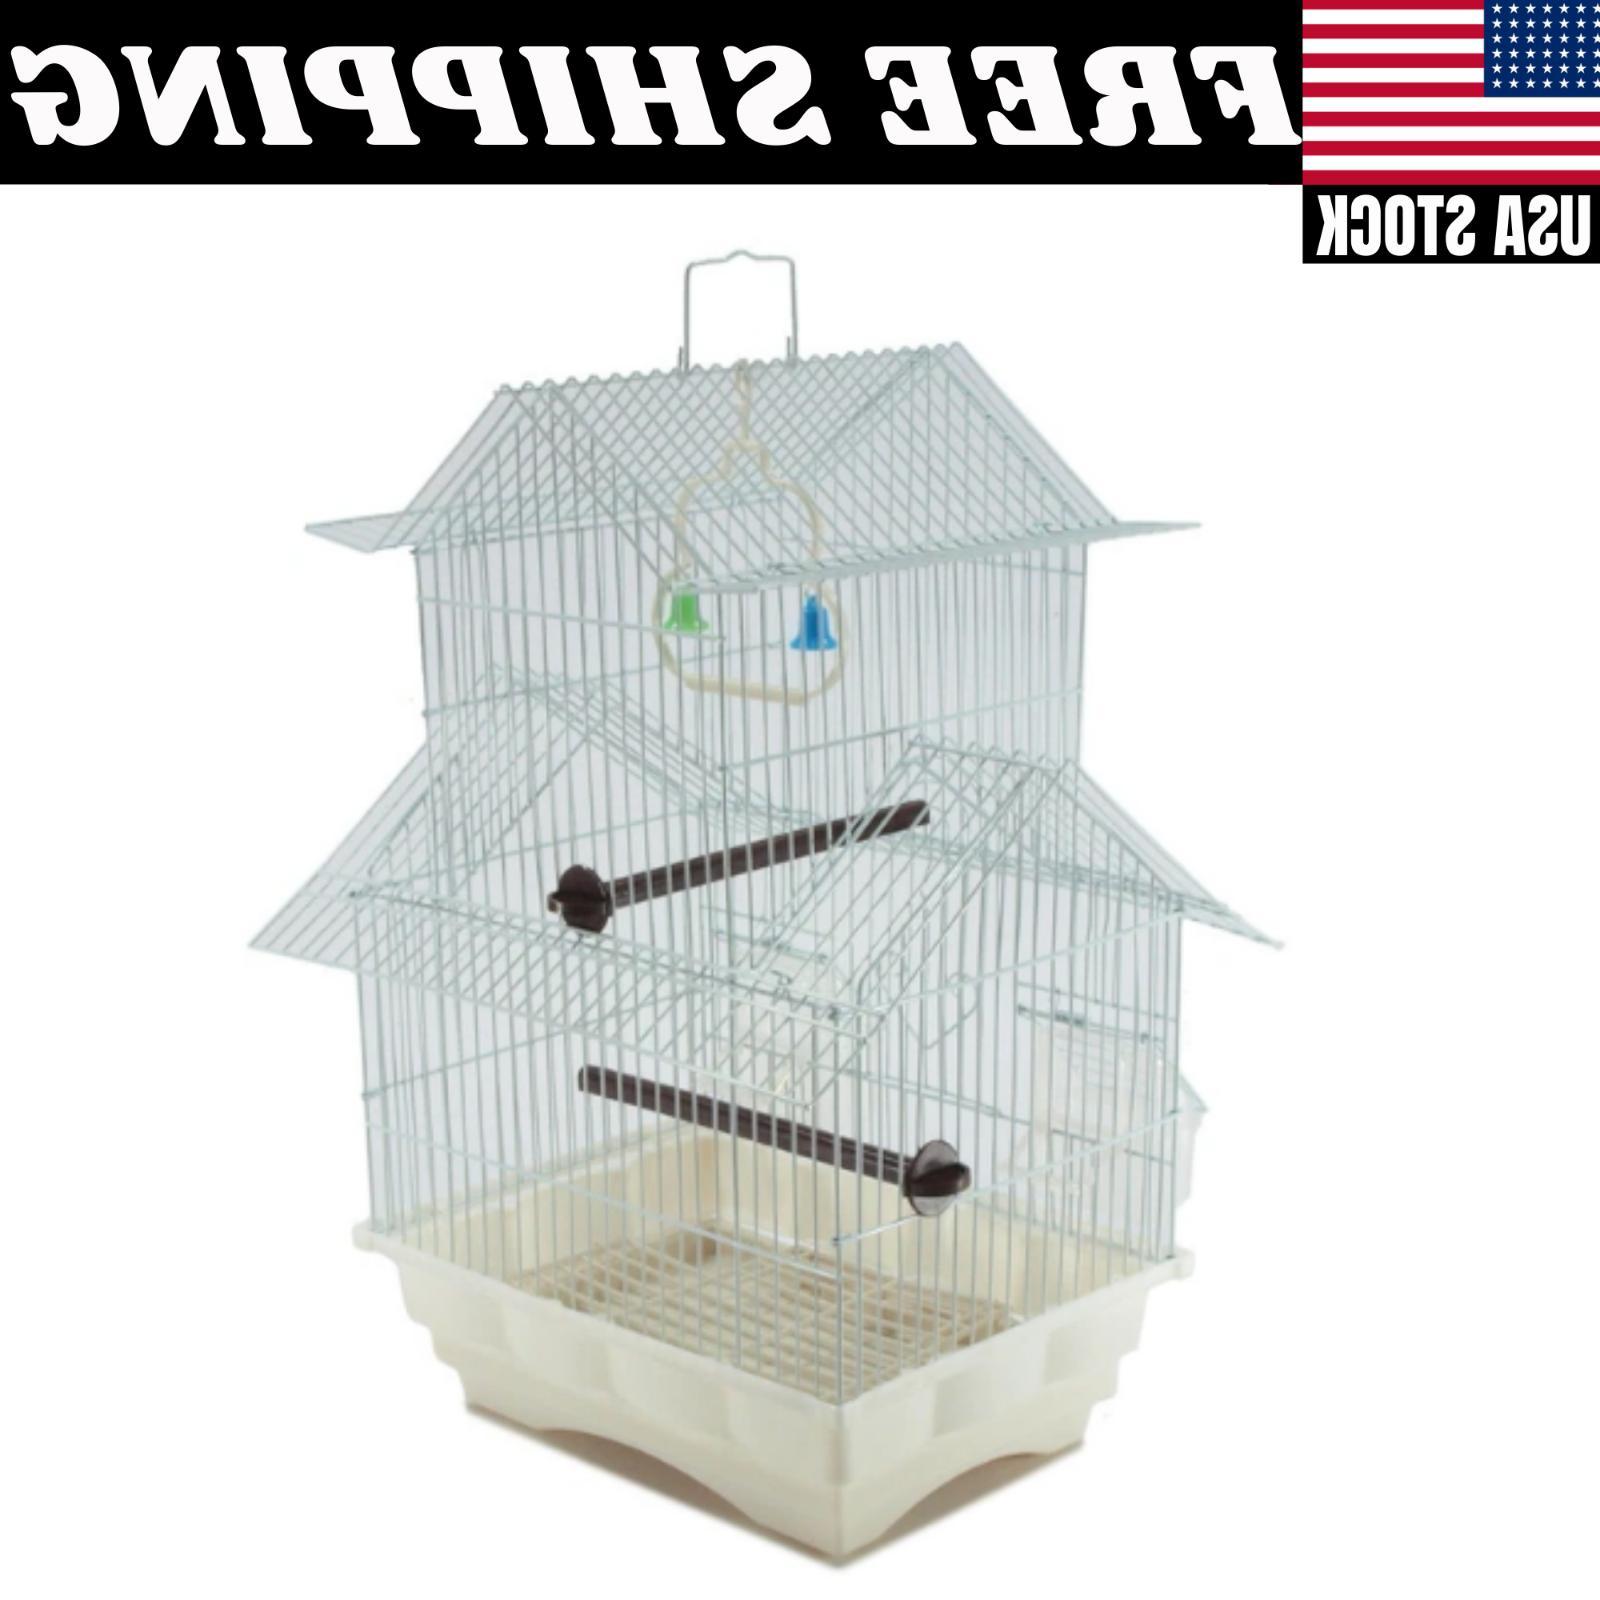 White Bird Style Perch Feeder Two Roof Design